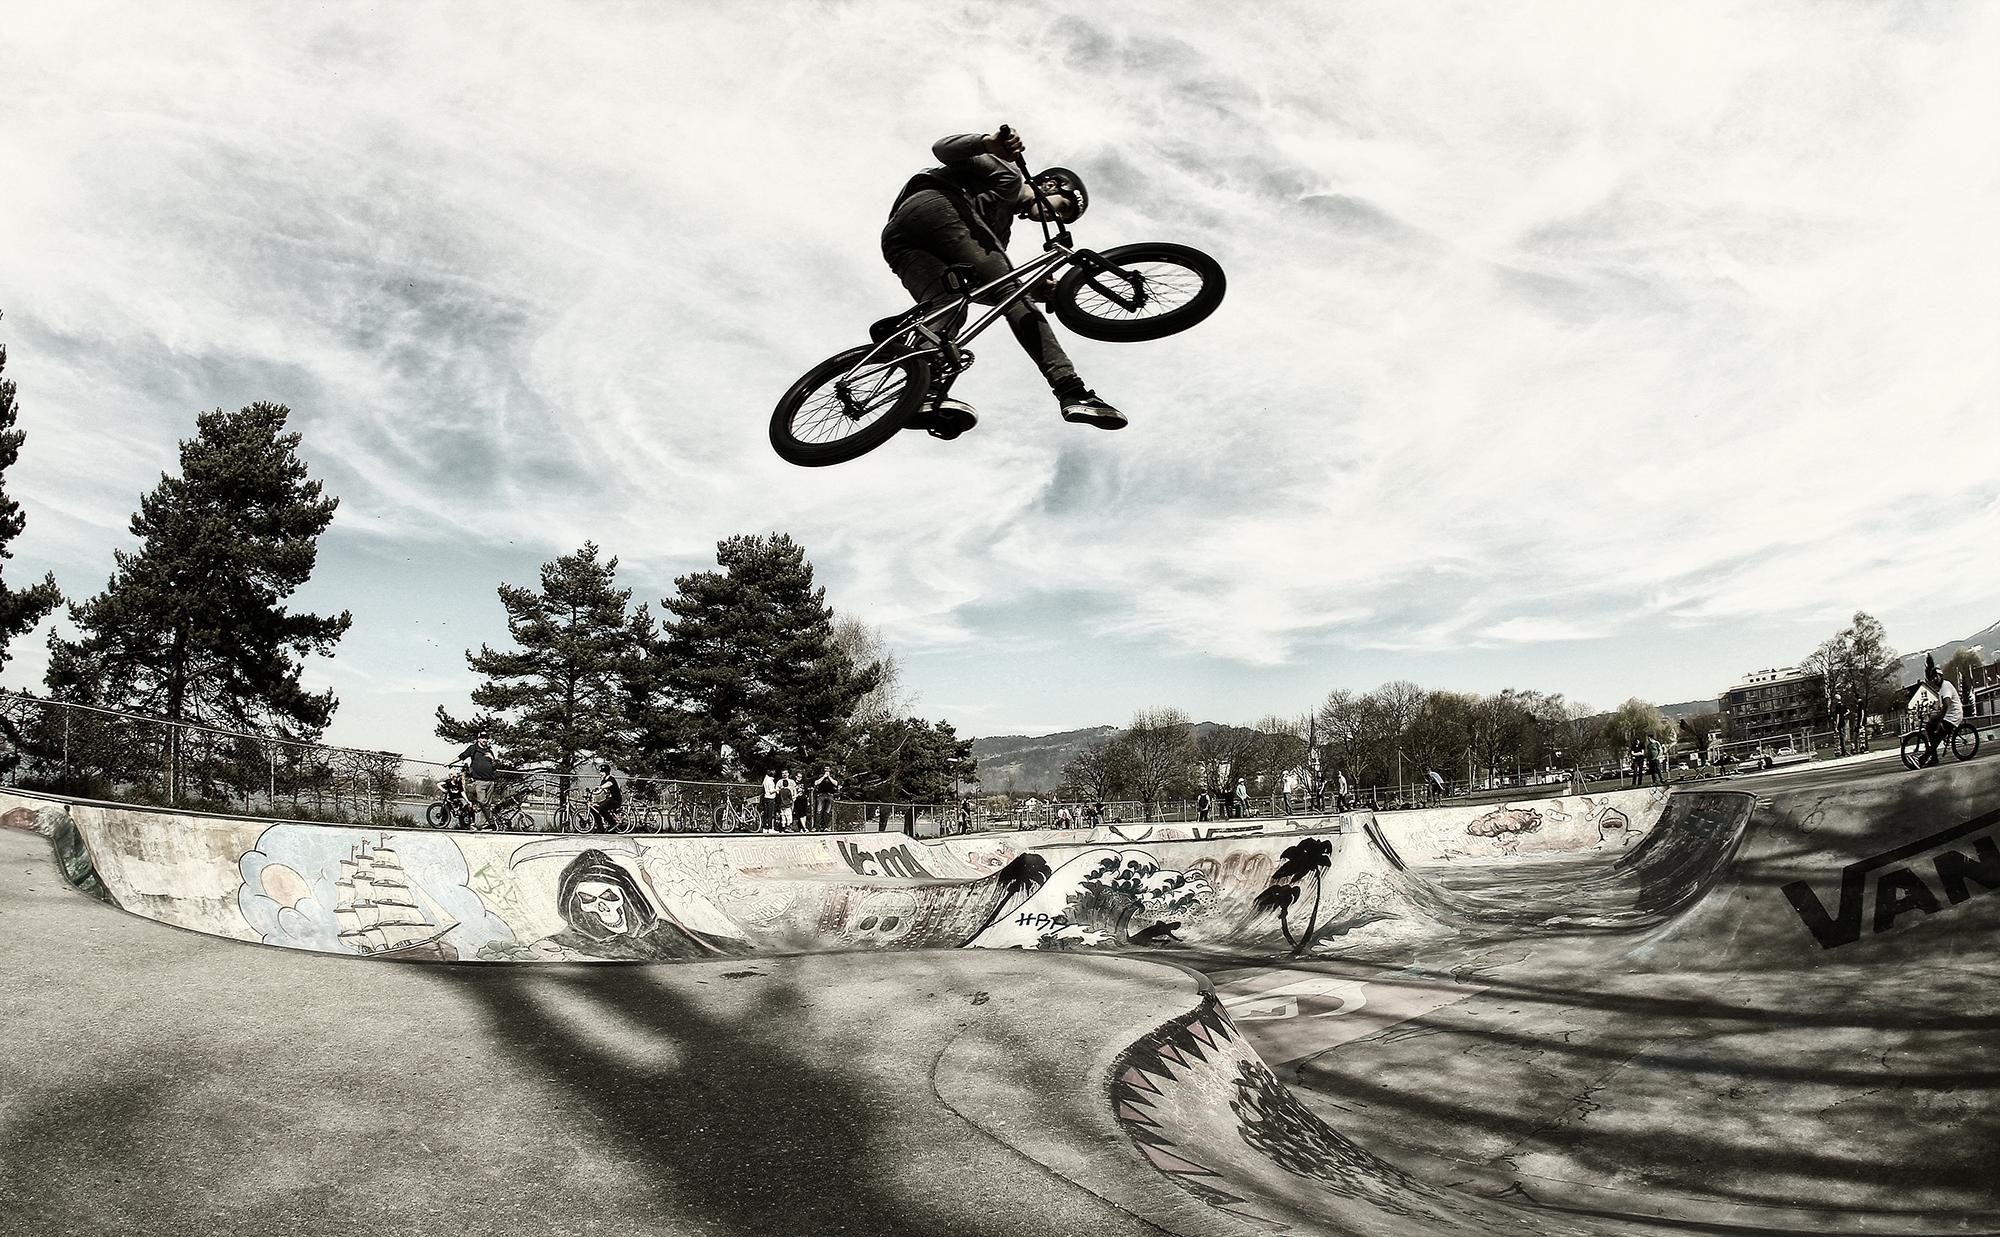 Bike Check Charlie Cavallaro - ilamebmx